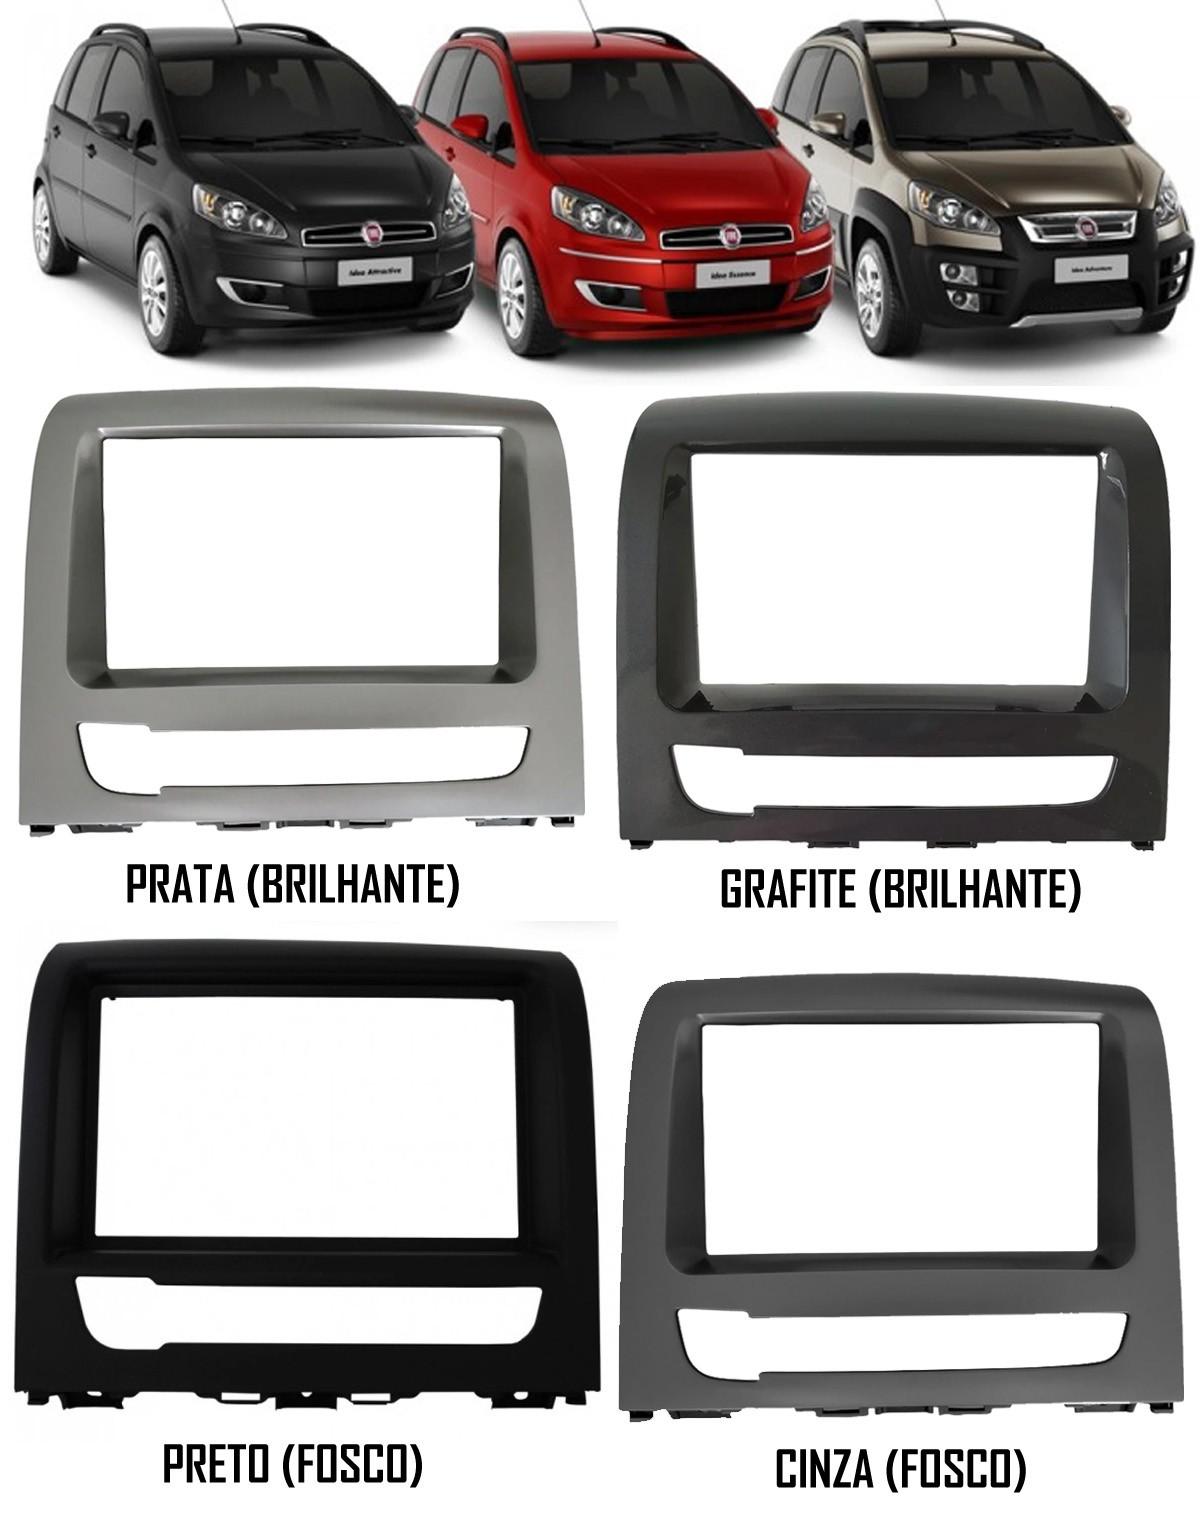 Moldura De Painel 2 Din Fiat Idea 2012 2013 2014 2015 2016 Para Cd Dvd 2 Dins